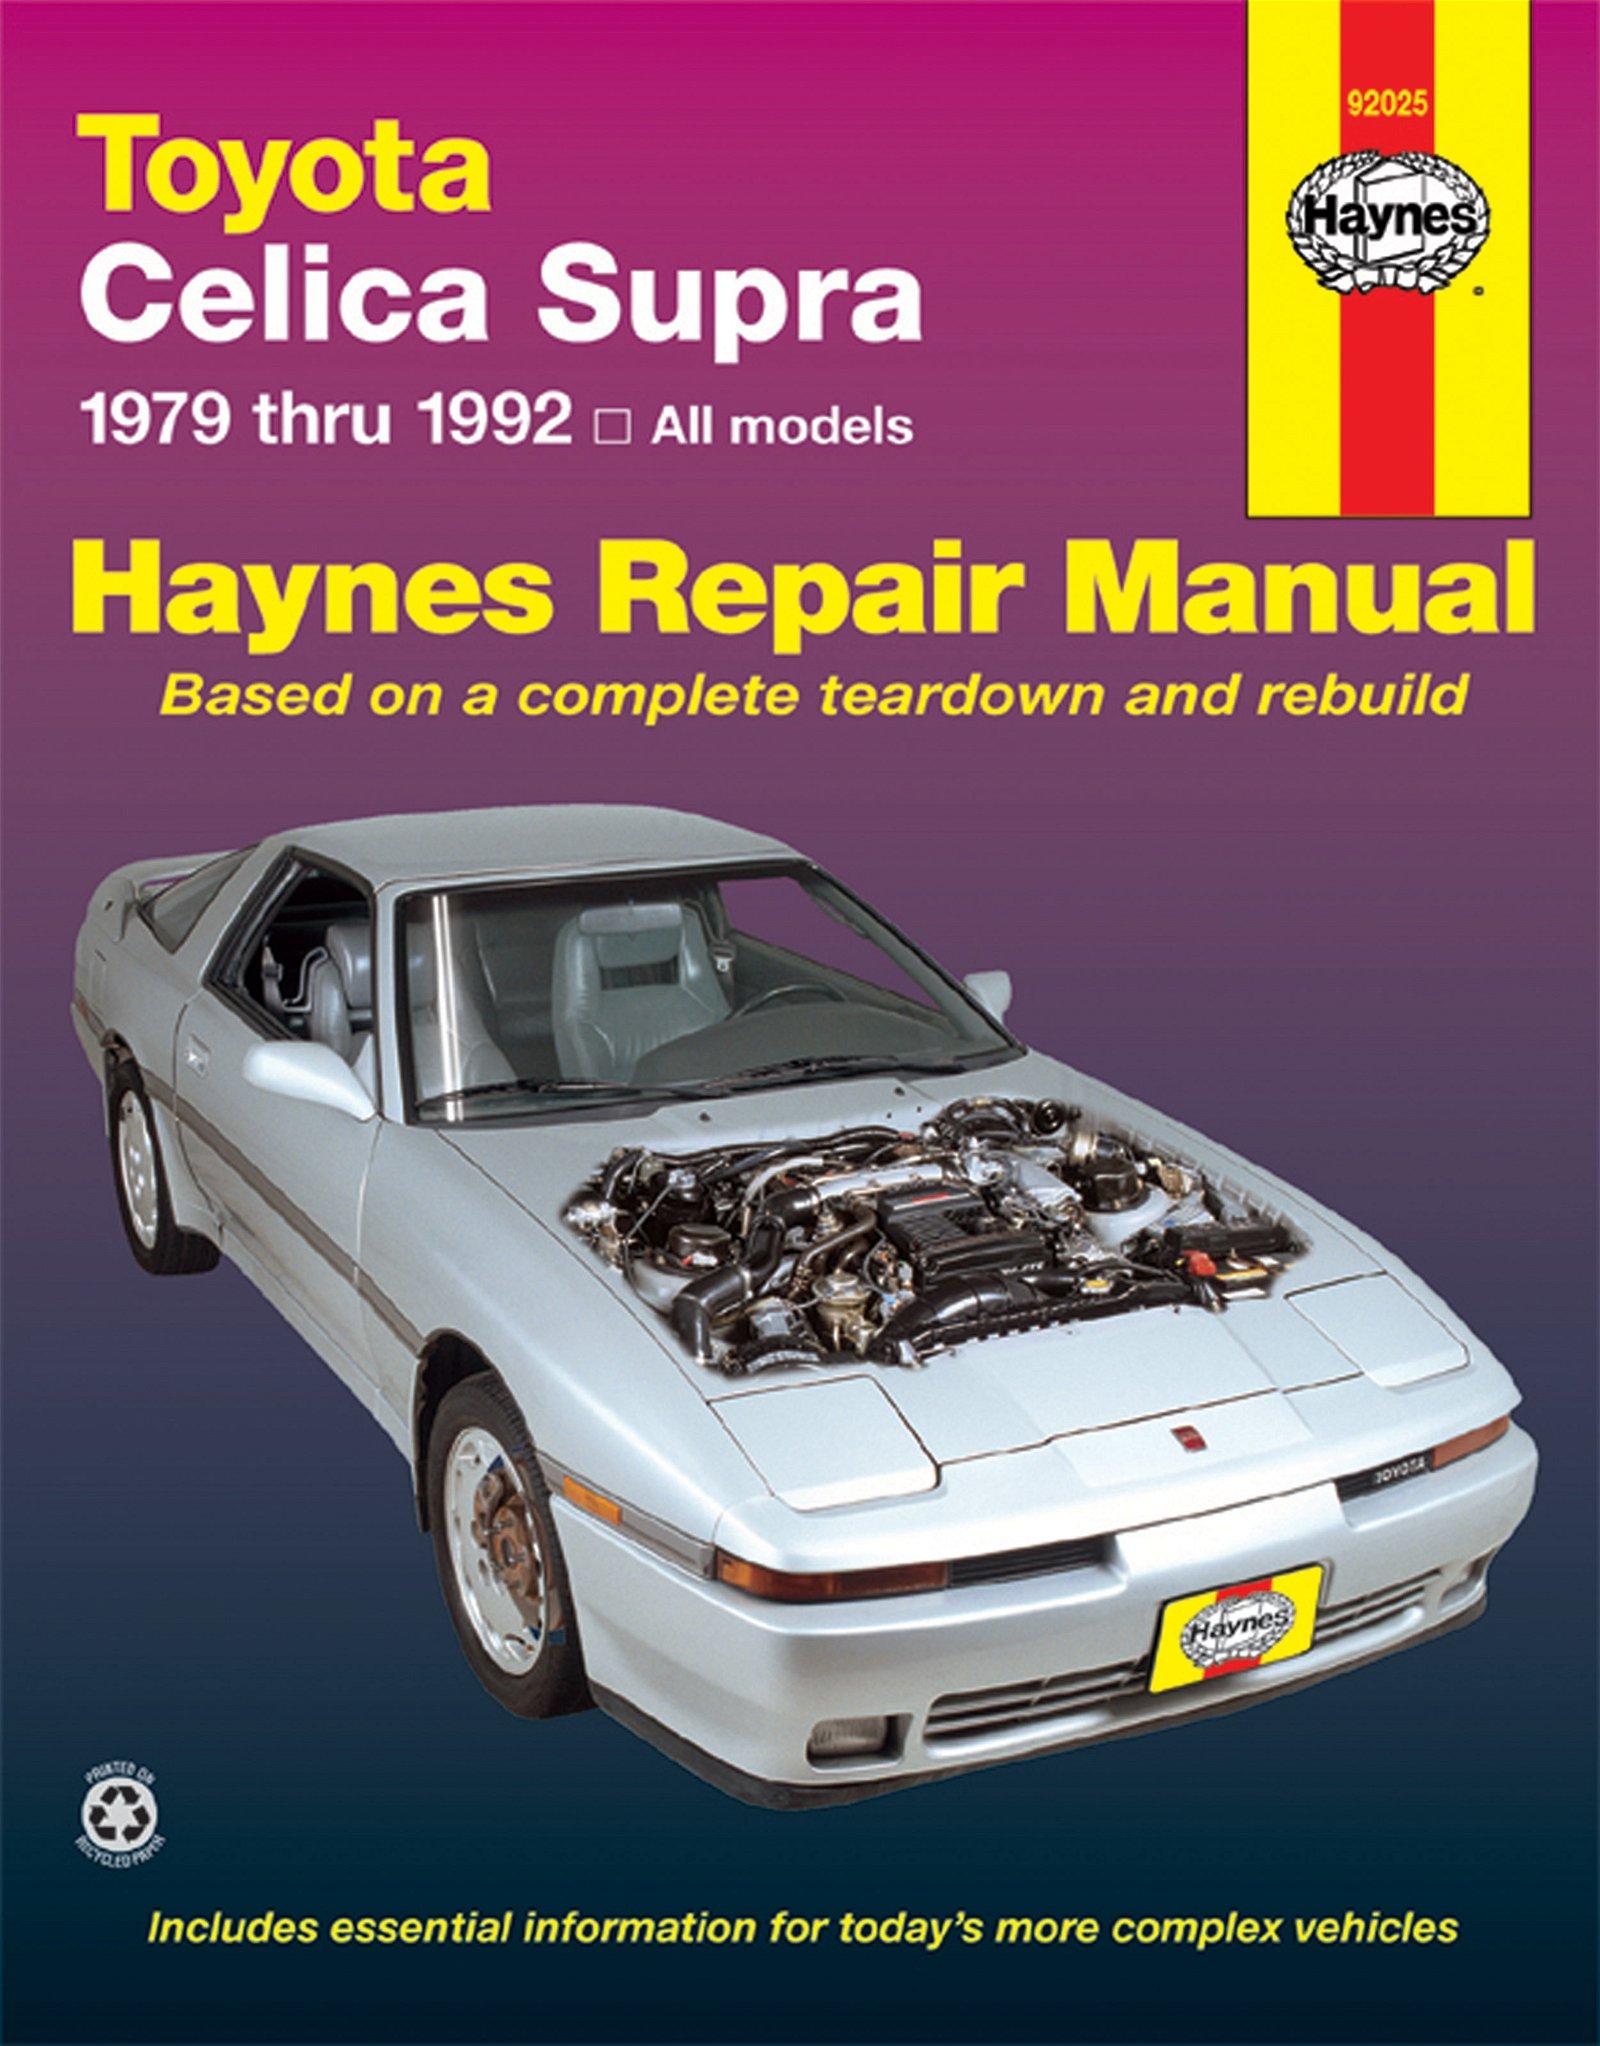 [Manuel US en Anglais] Toyota Celica Supra  '79 -  '92